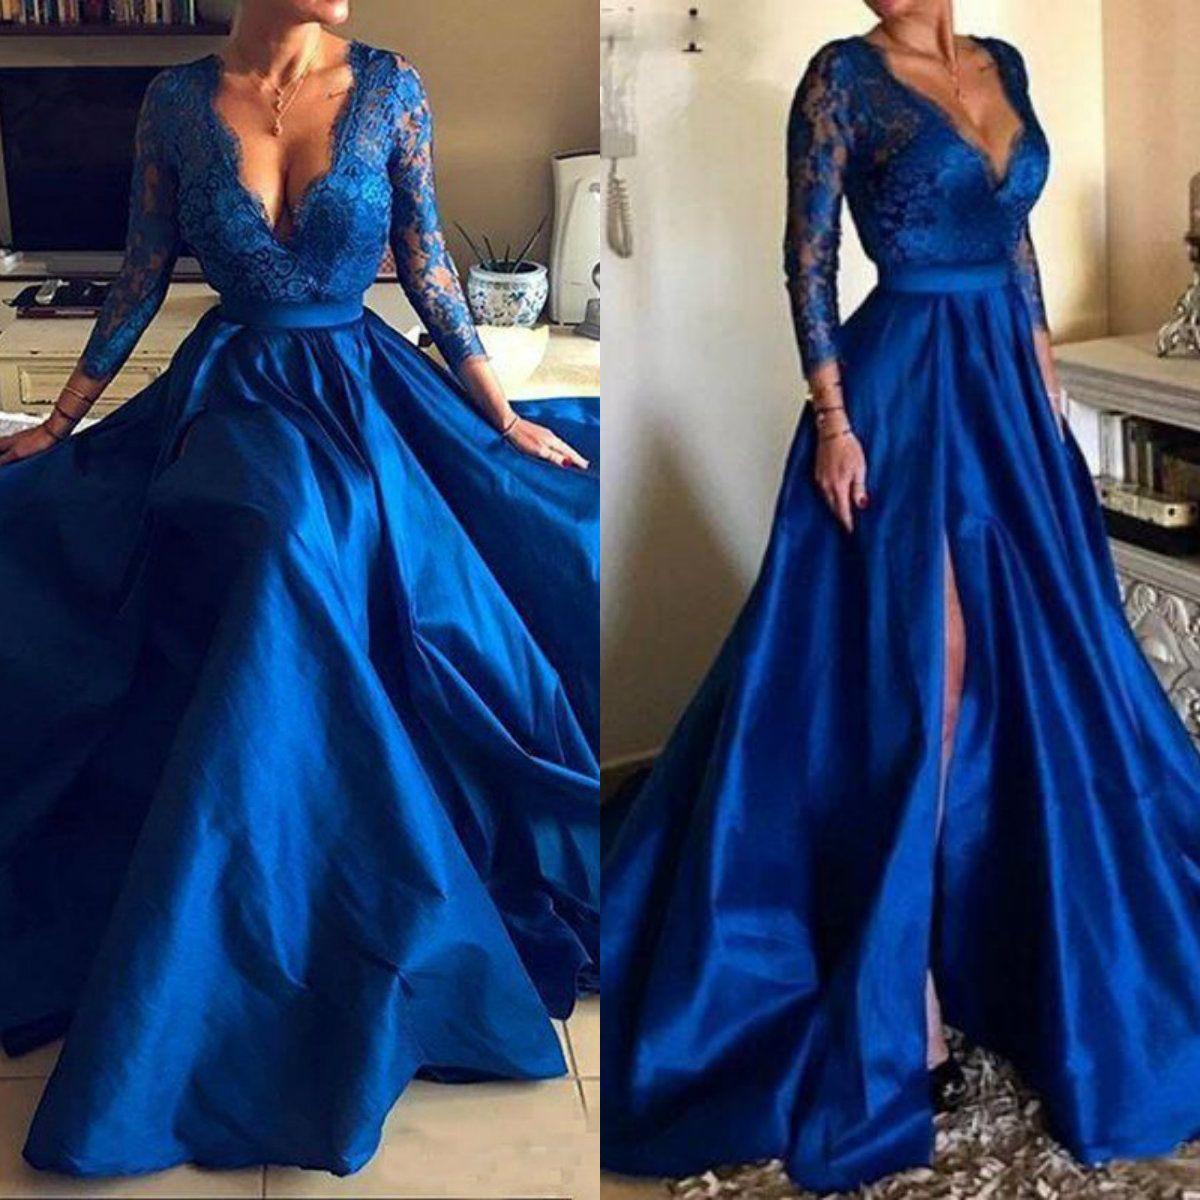 2019 Royal Blue Mother of the Bride Dresses Plus Size V Neck Lace Appliques Long Sleeve Formal Front Split Evening Gowns Vestidos